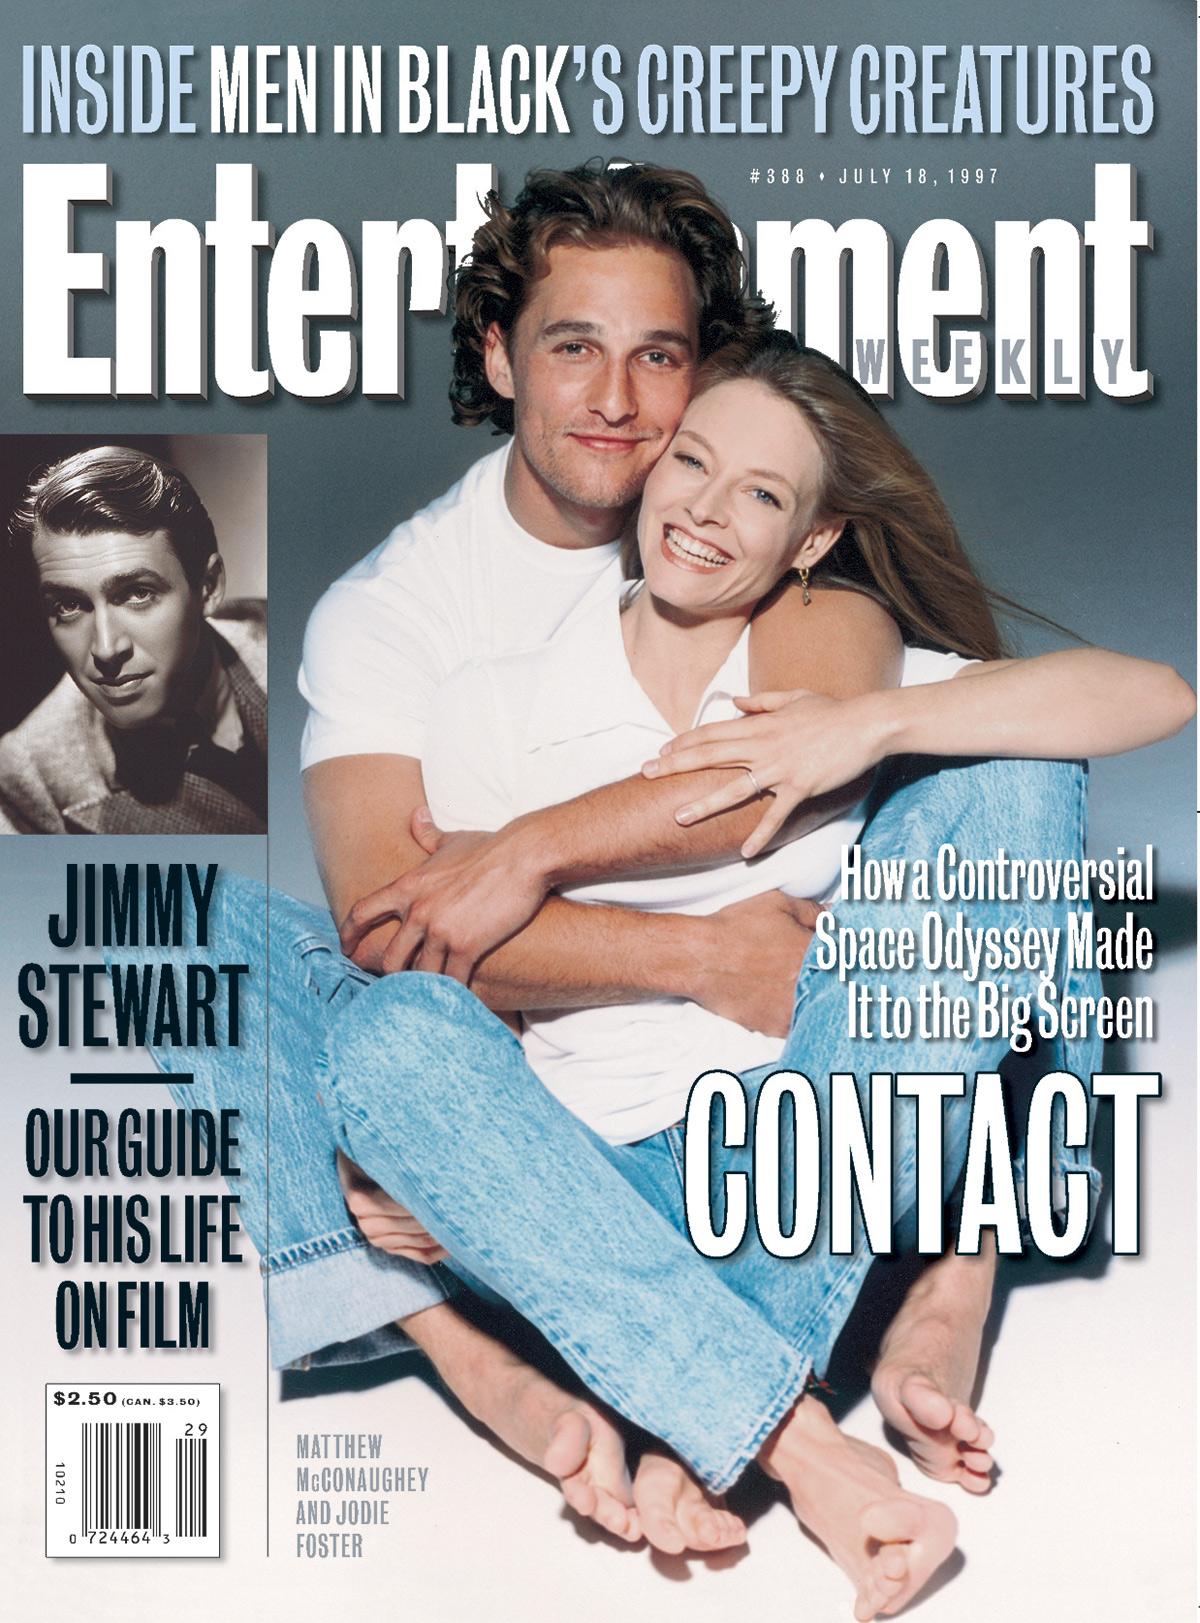 Entertainment WeeklyMatthew Mcconaughey, Jodie FosterJuly 18, 1997# 388